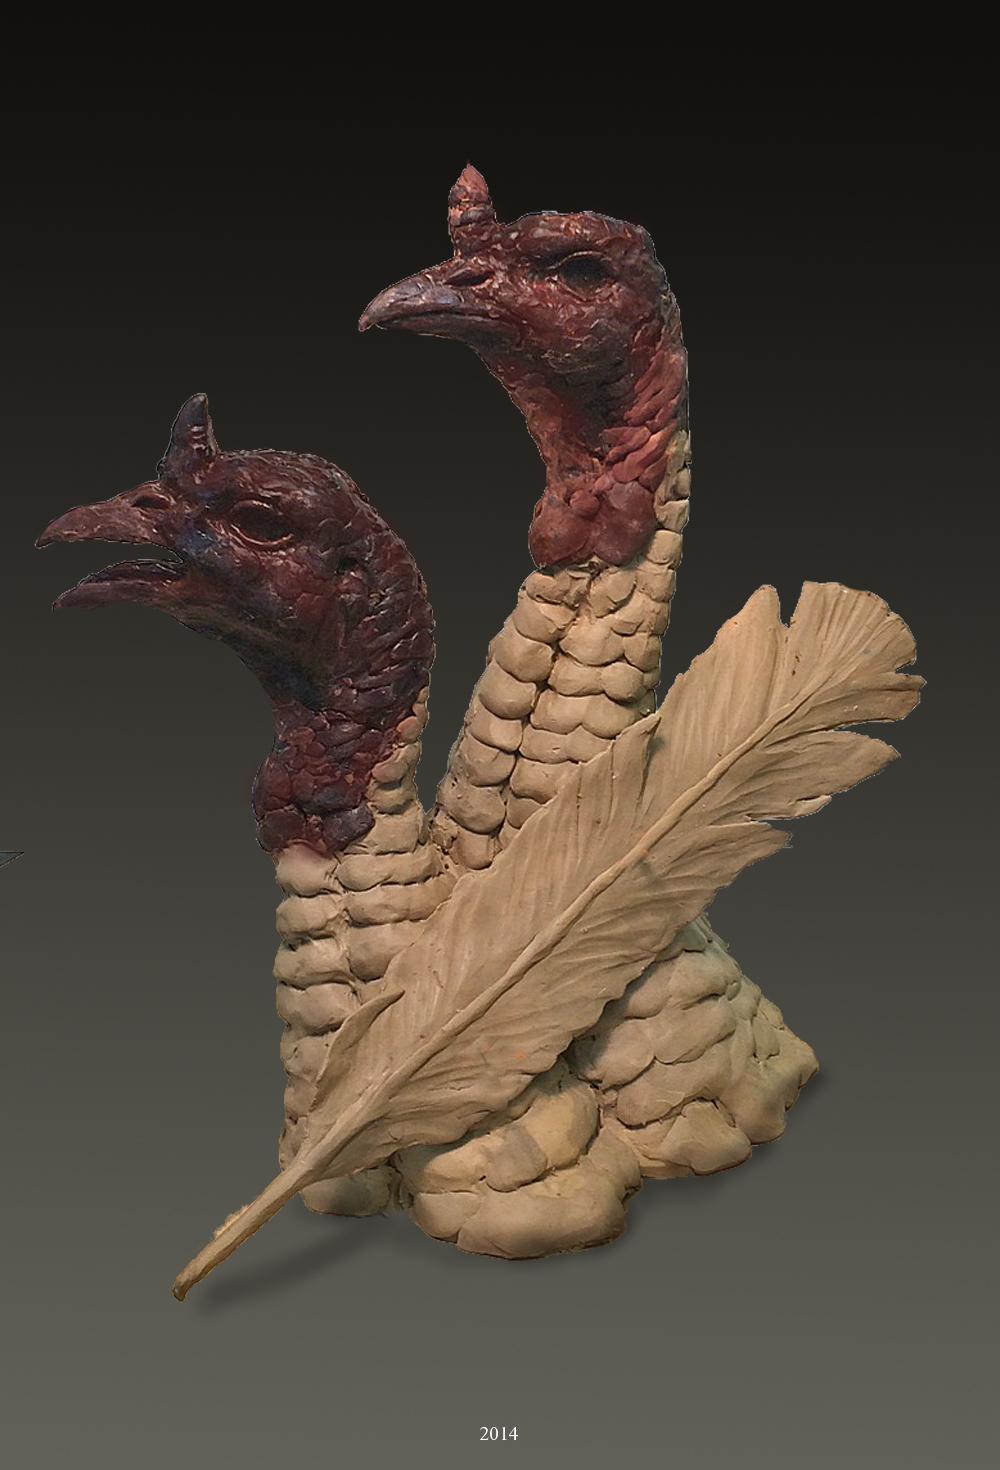 Turkey Bust in Clay - Savides Sculpture New Sculpture Clay Sculpture